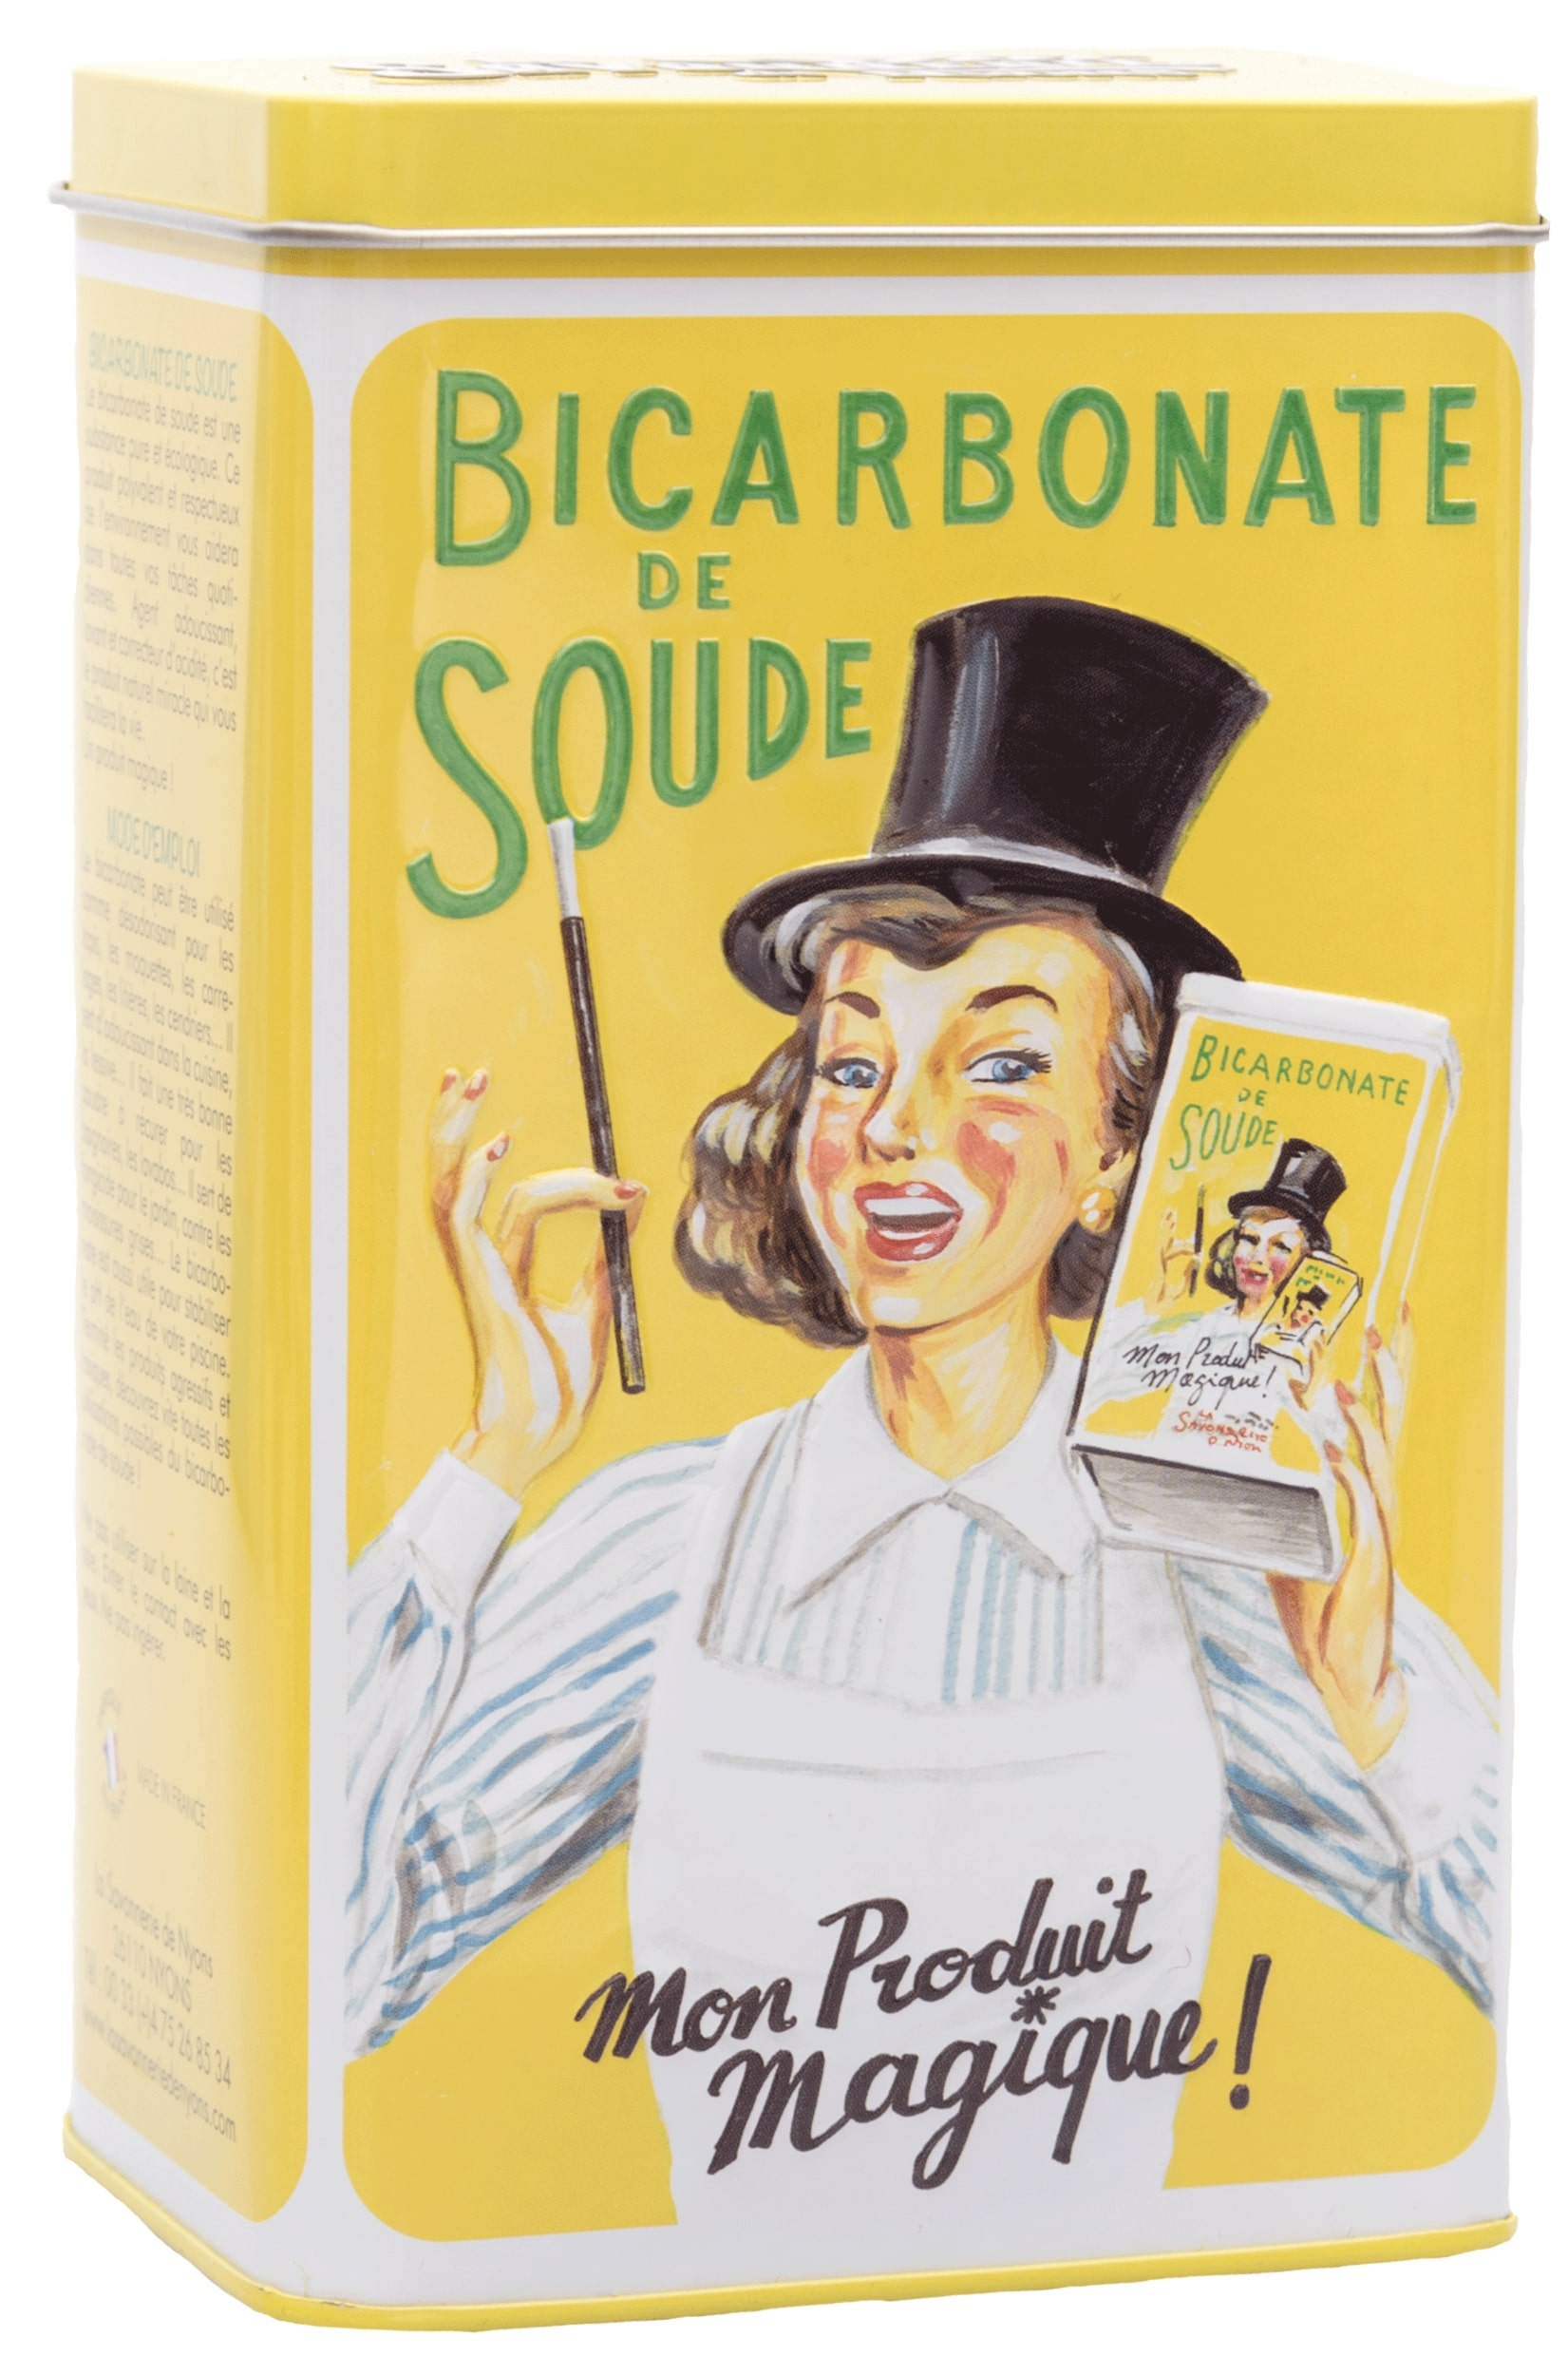 Bicarbonate de Soude / Baking Soda - 750g